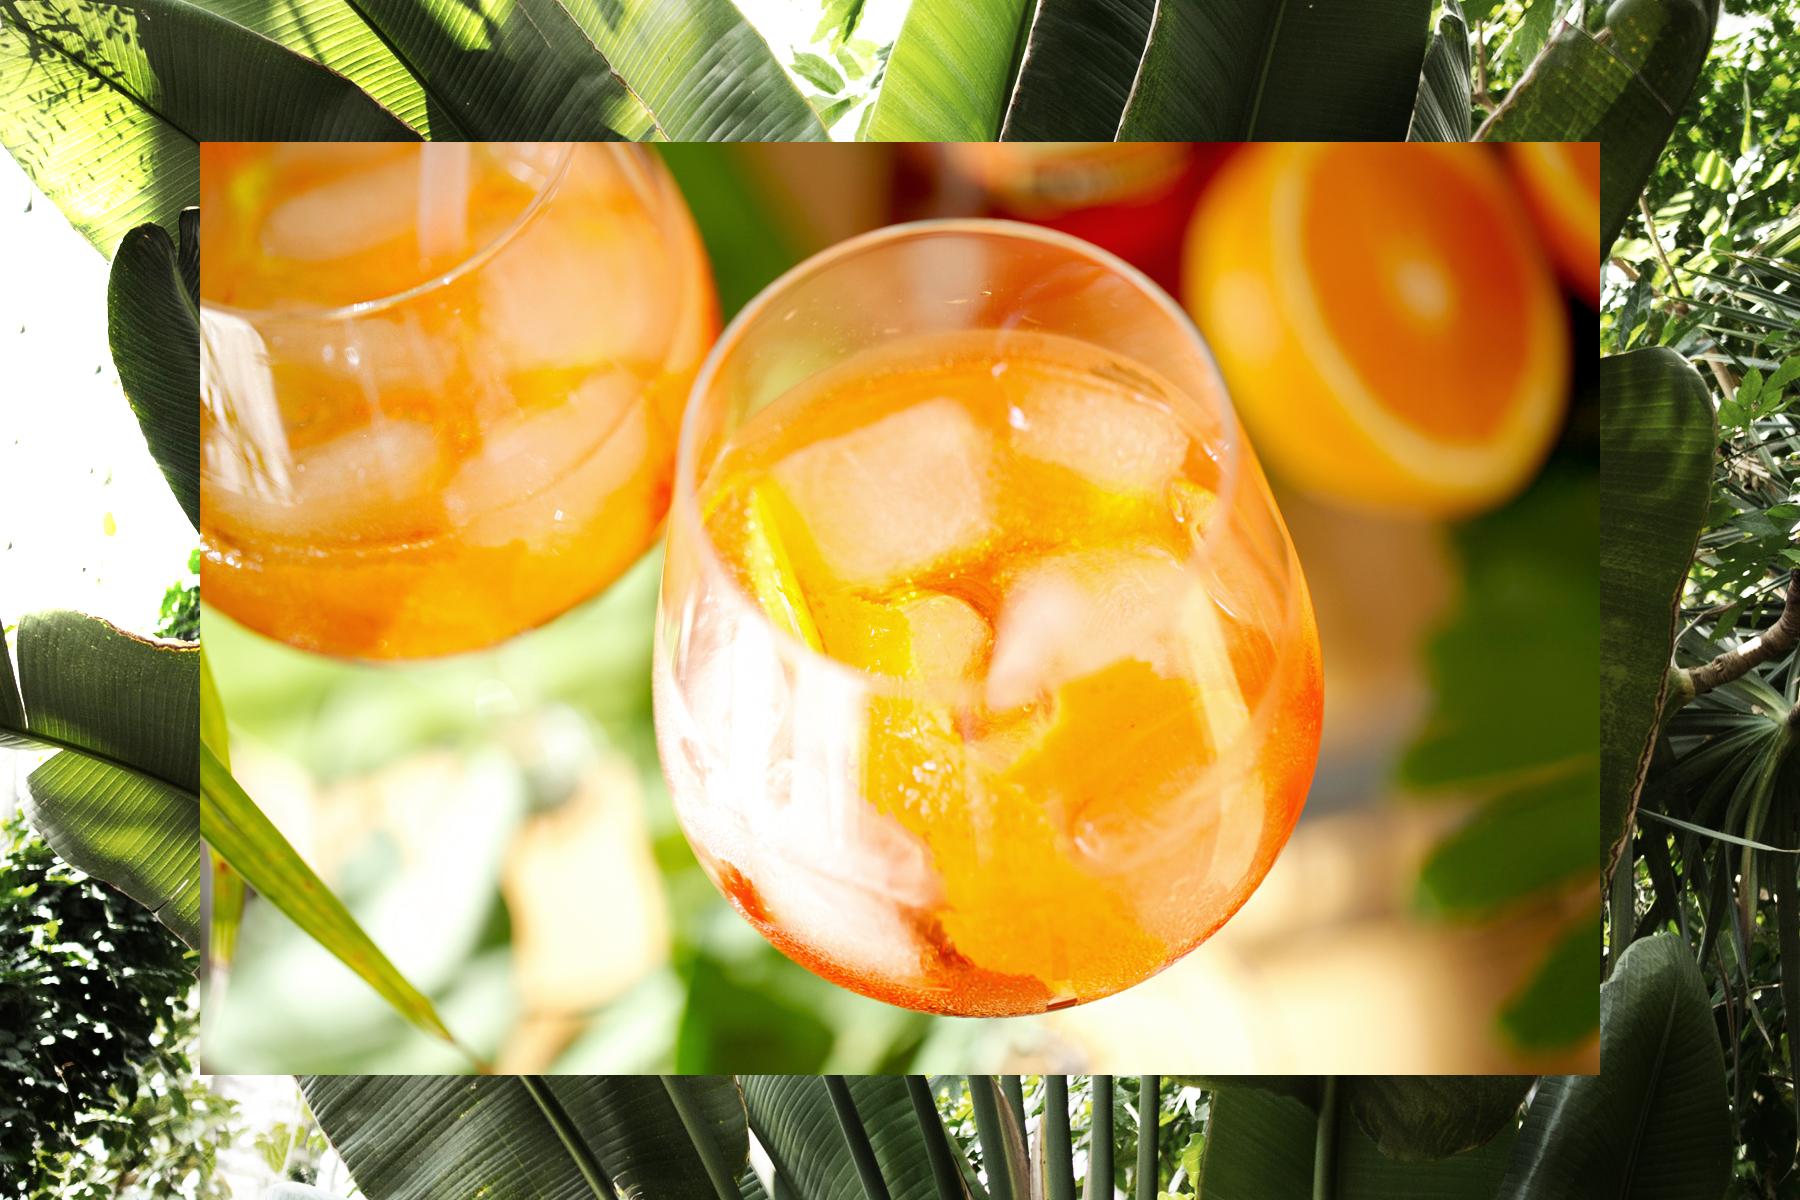 aperol spritz summer aperitif drink cocktail recipe personal urban jungle garden palm tree holiday feeling white crochet dress hm gucci belt saint laurent wedges dionysus ricarda schernus fashionblogger 1